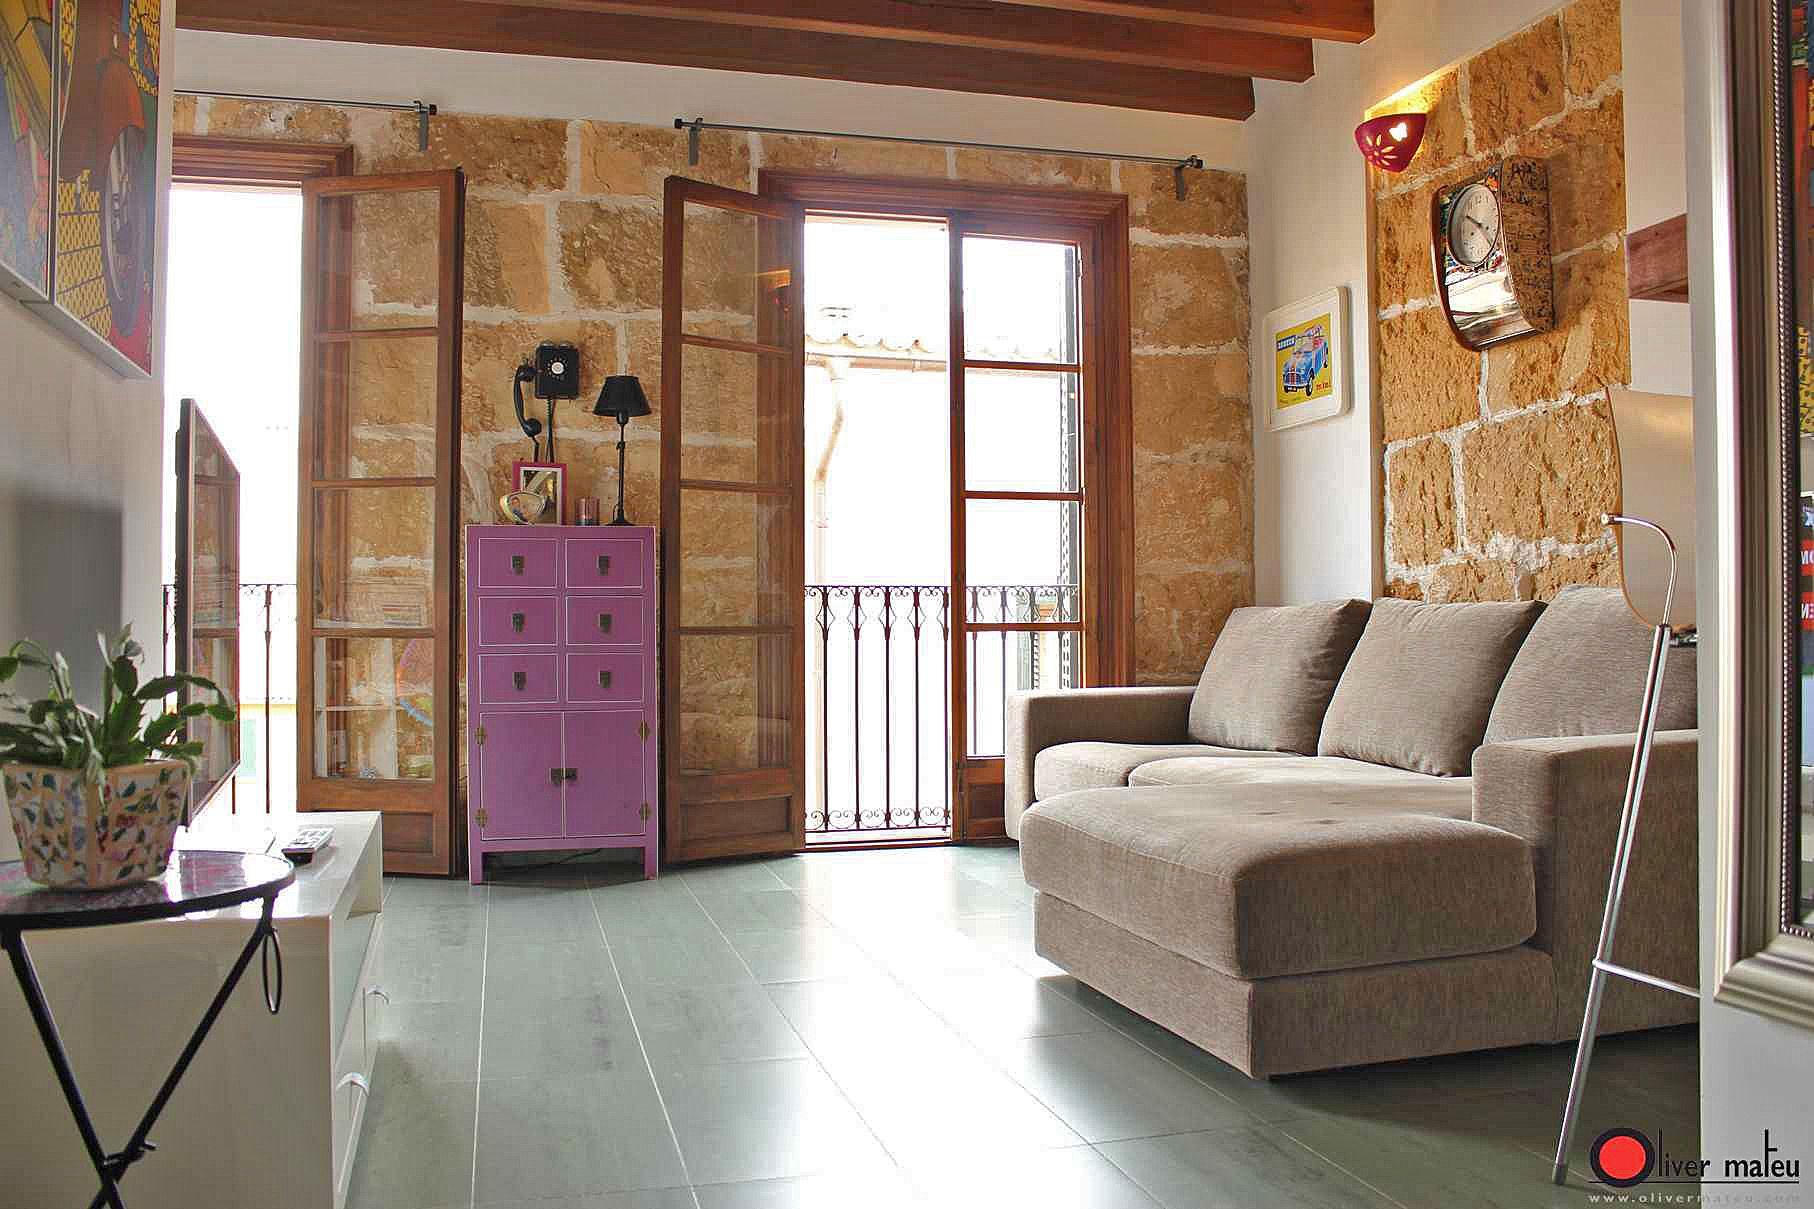 Ref. 28547 #Palma #Mallorca #CascoAntiguo #OldTown #Altstadt